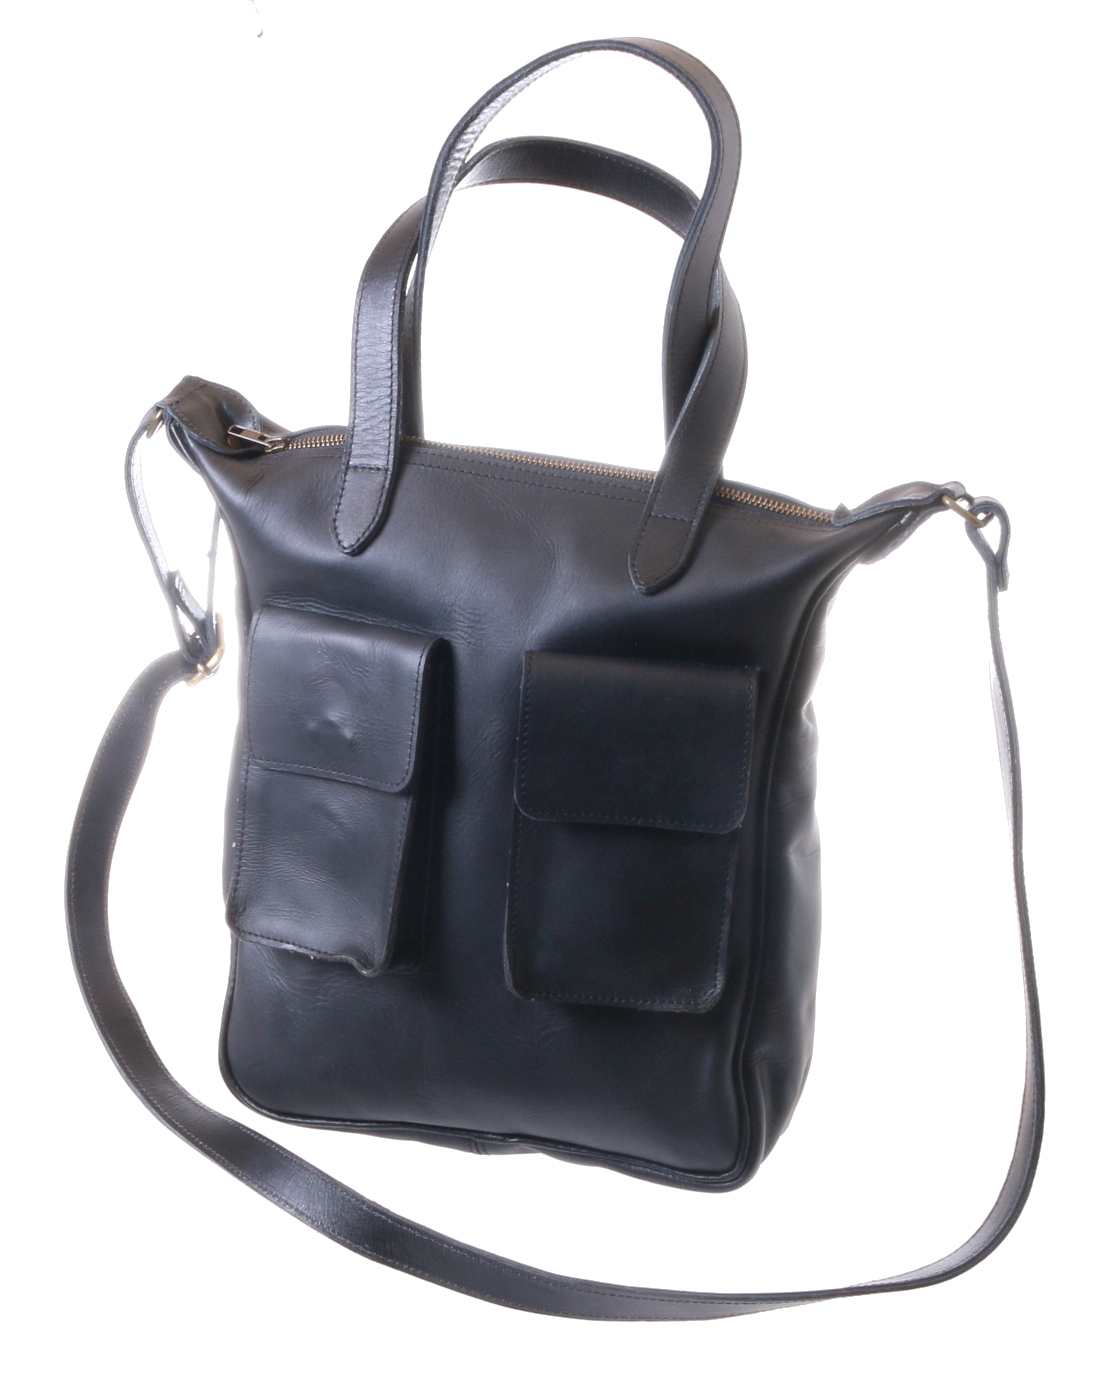 Gundara - black cross-body bag genuine cow leather - handmade & fair from Ethiopia